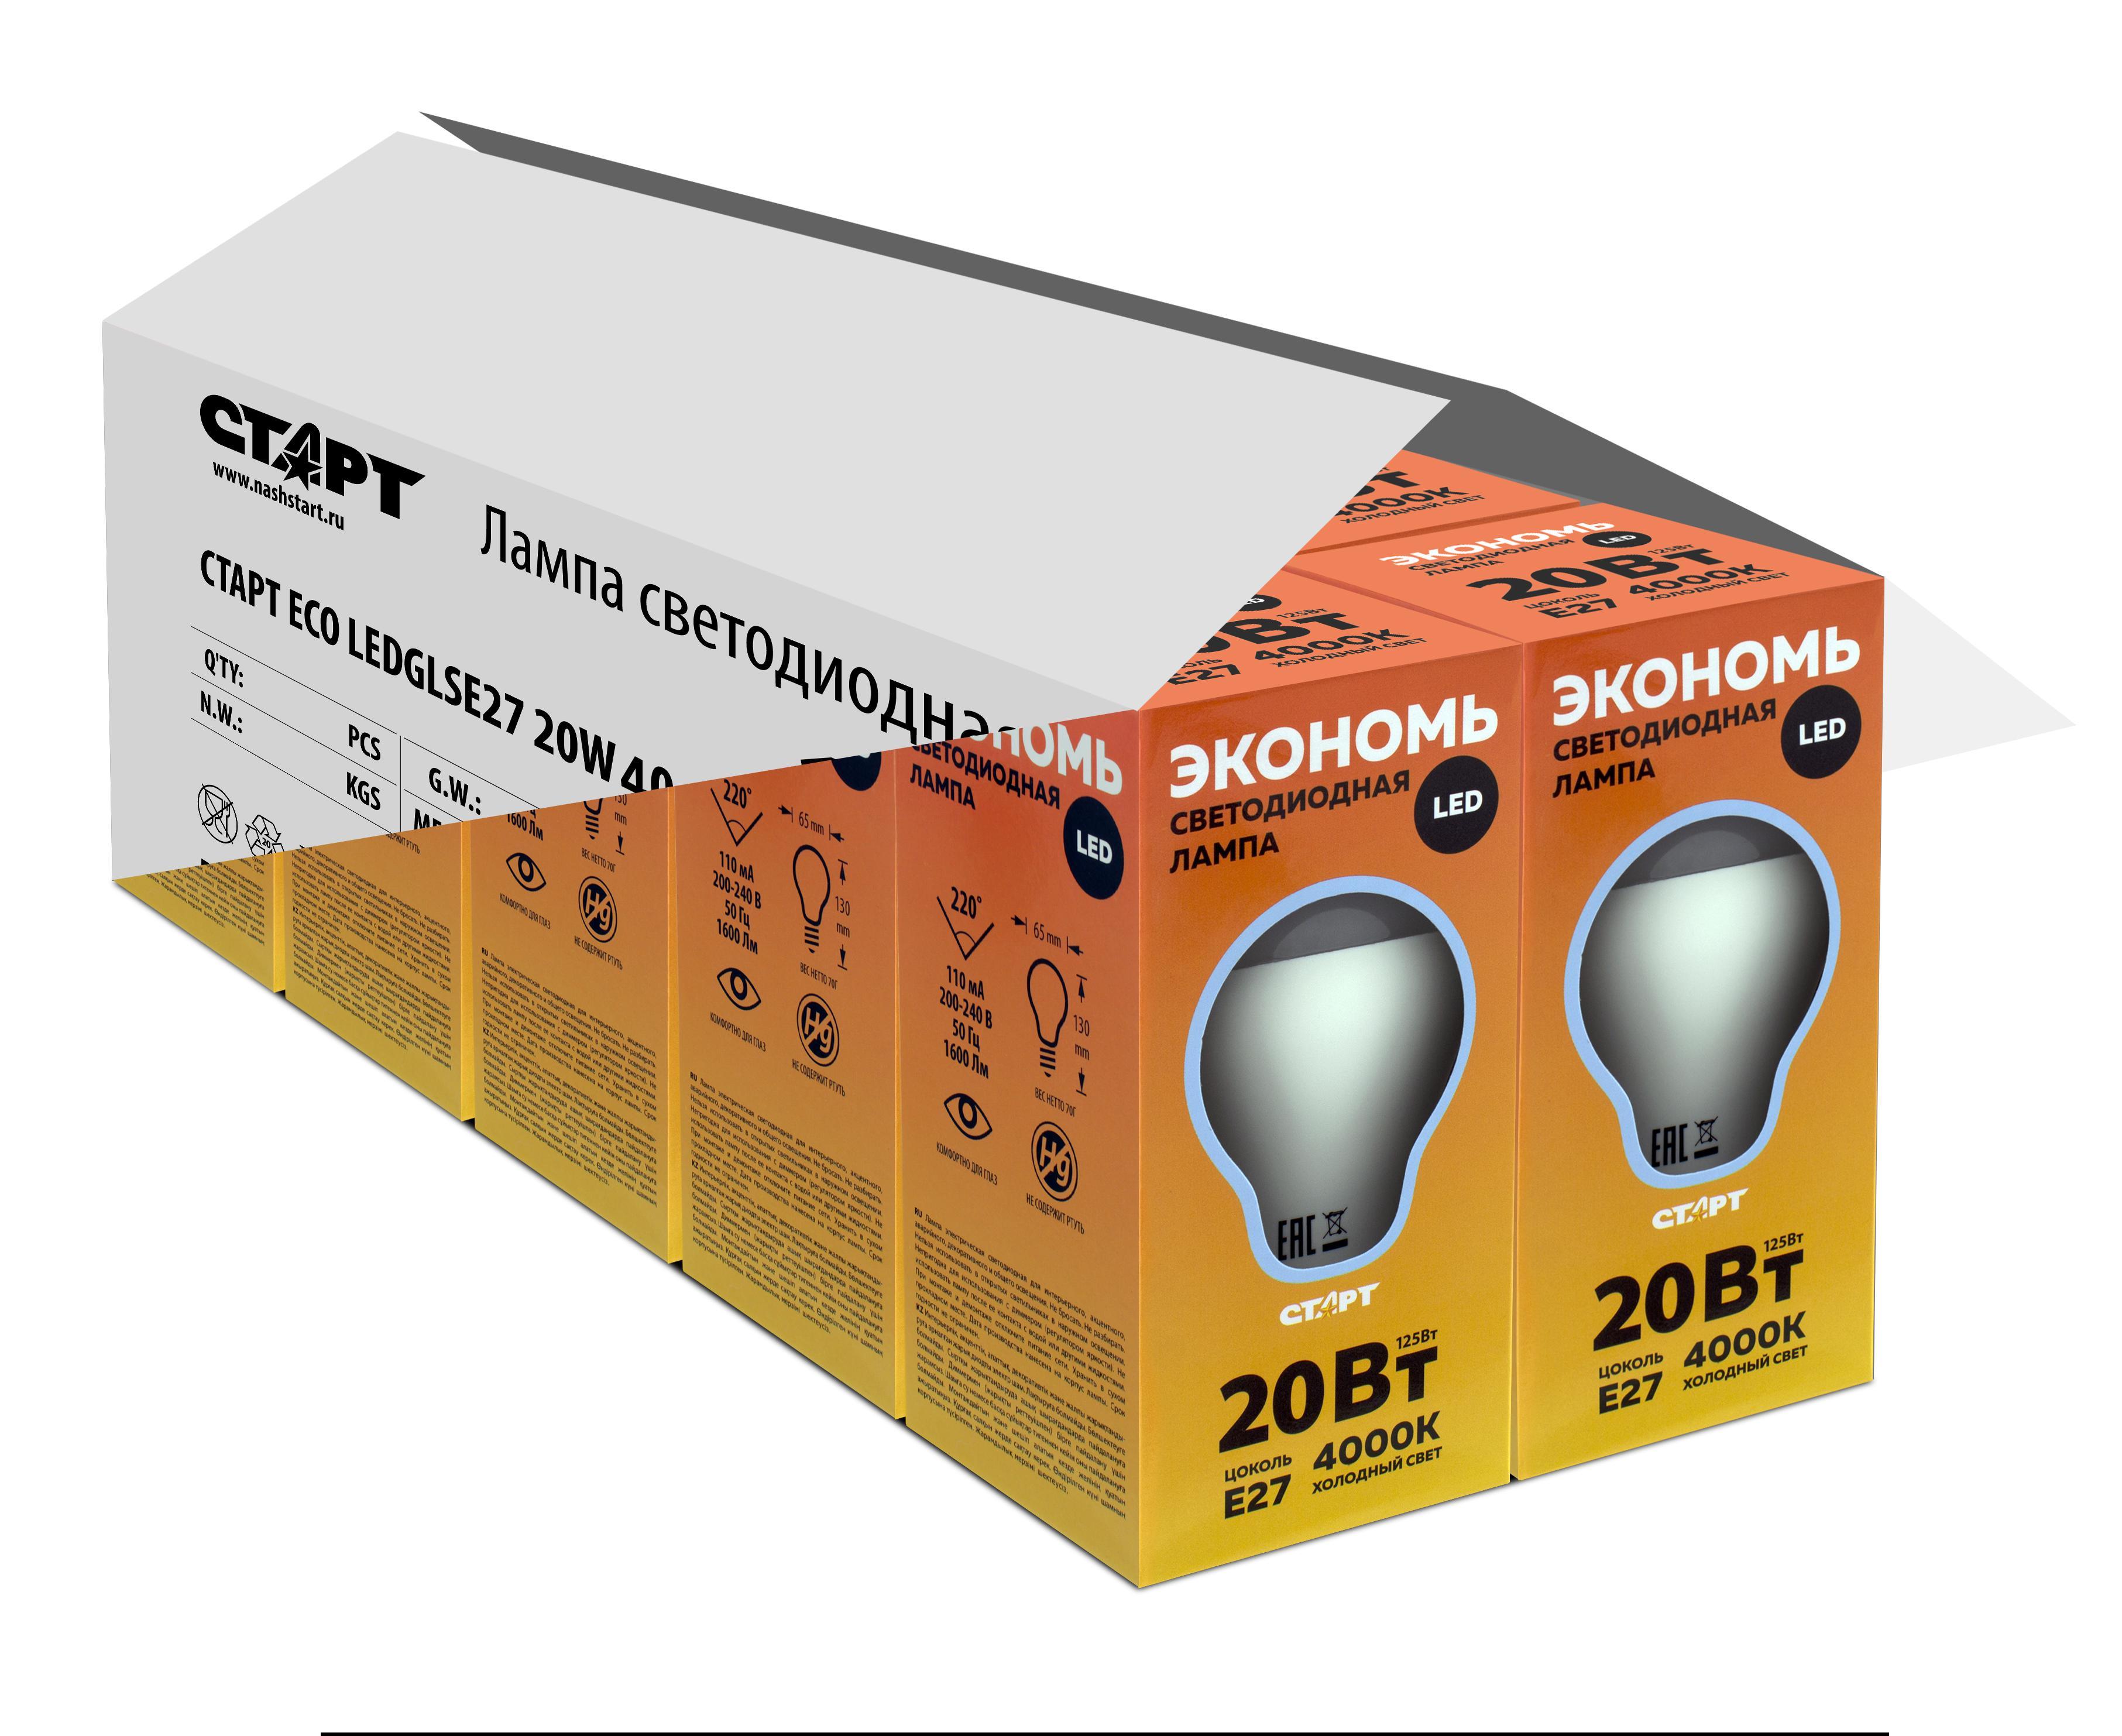 Лампа светодиодная СТАРТ Eco ledgls e27 20w 4000К хол свет. ПРОМОНАБОР